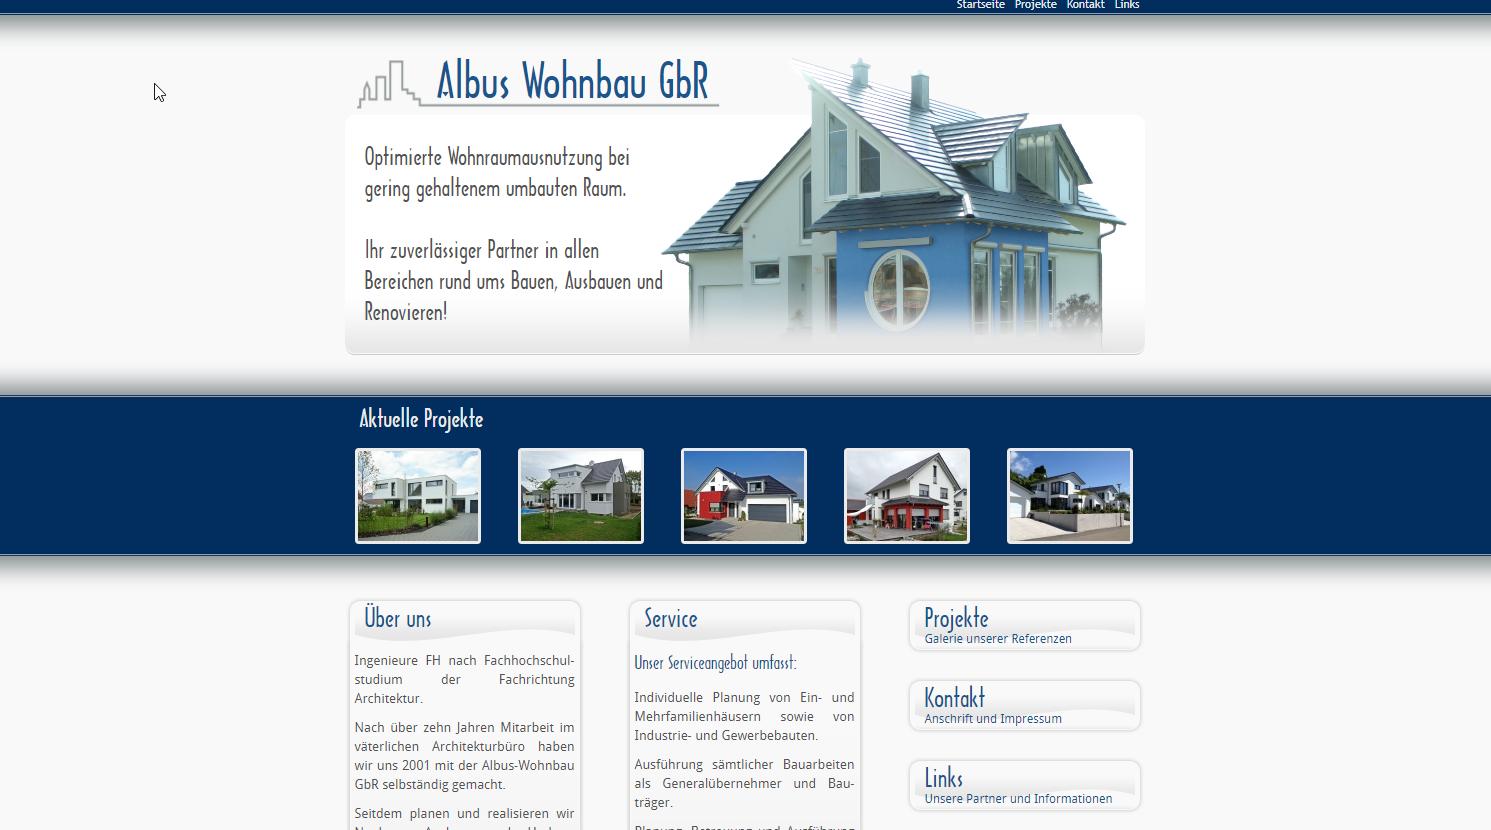 Albus-Wohnbau-GbR.png